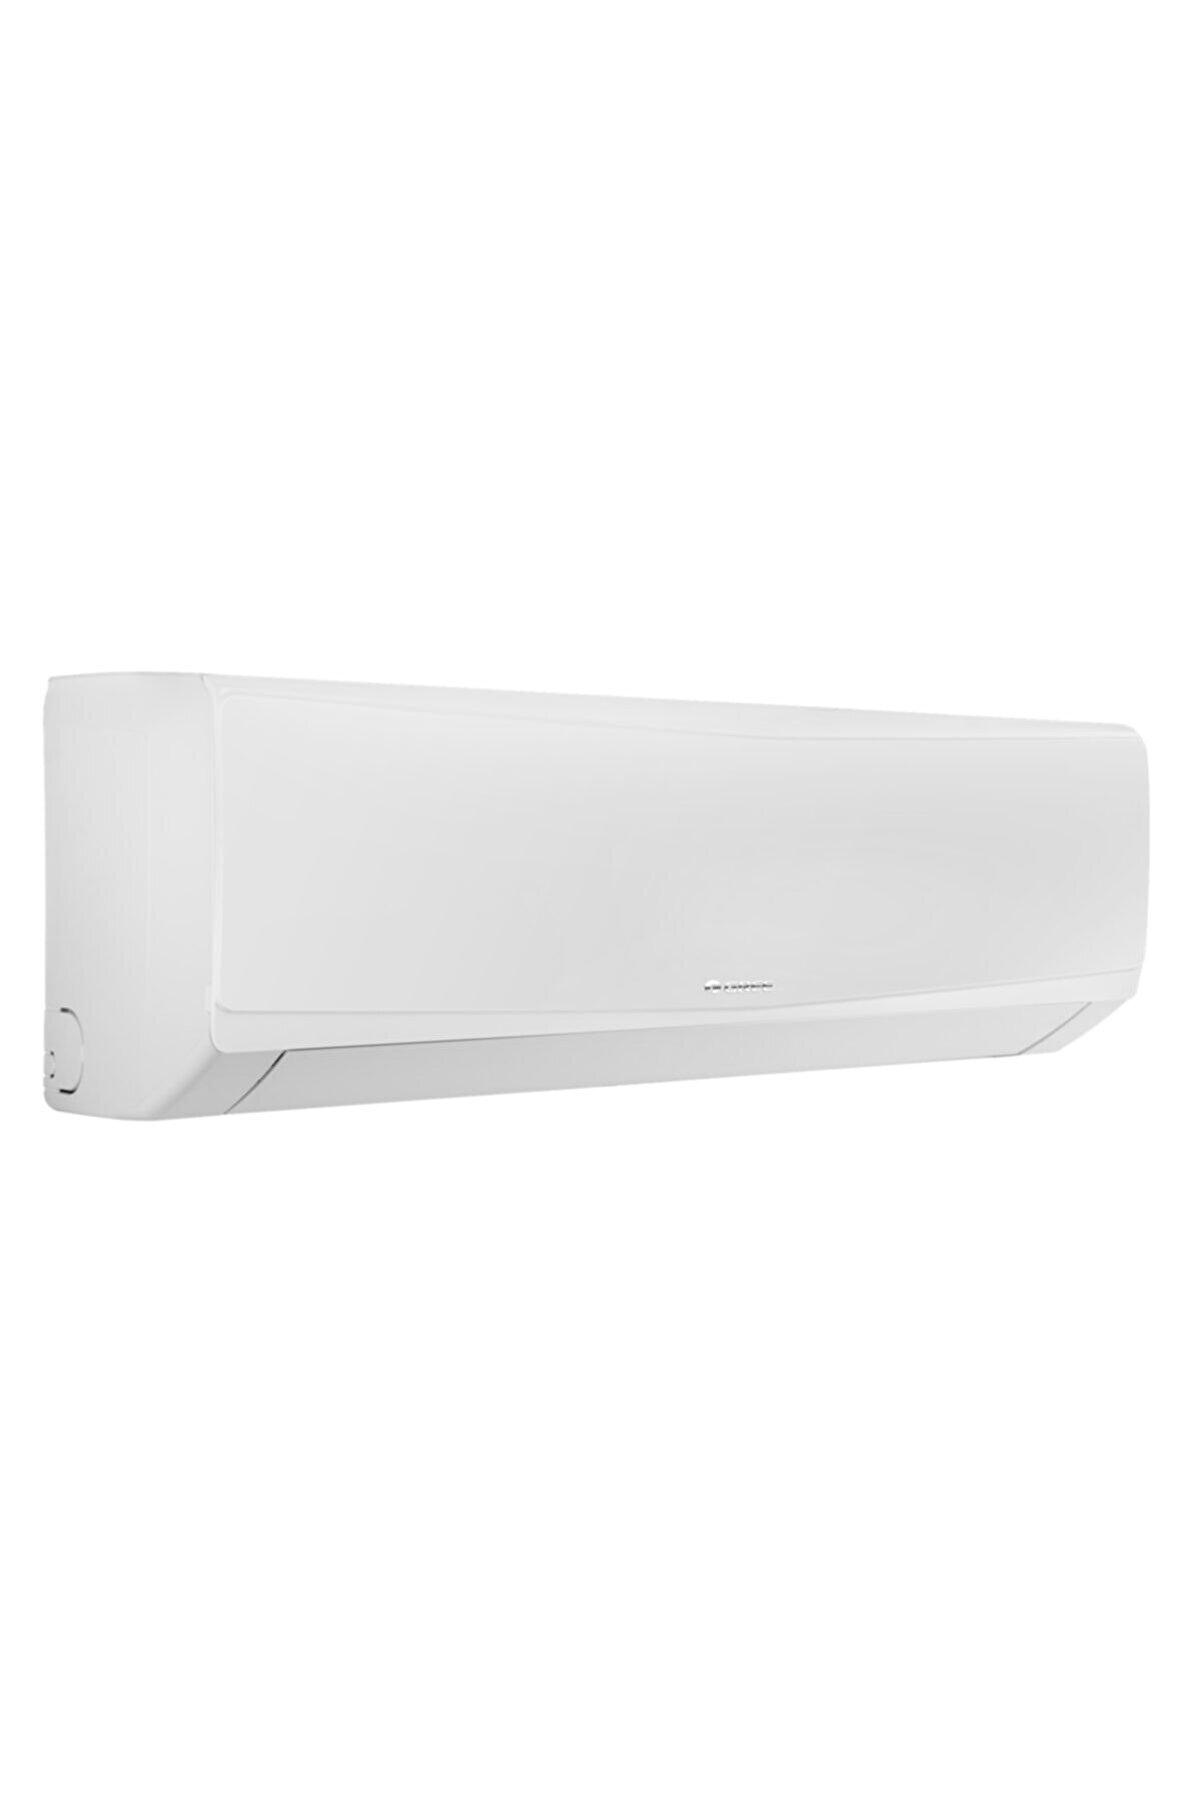 Gree Aphro 12.000 Btu Duvar Tipi Inverter Klima A++ Beyaz